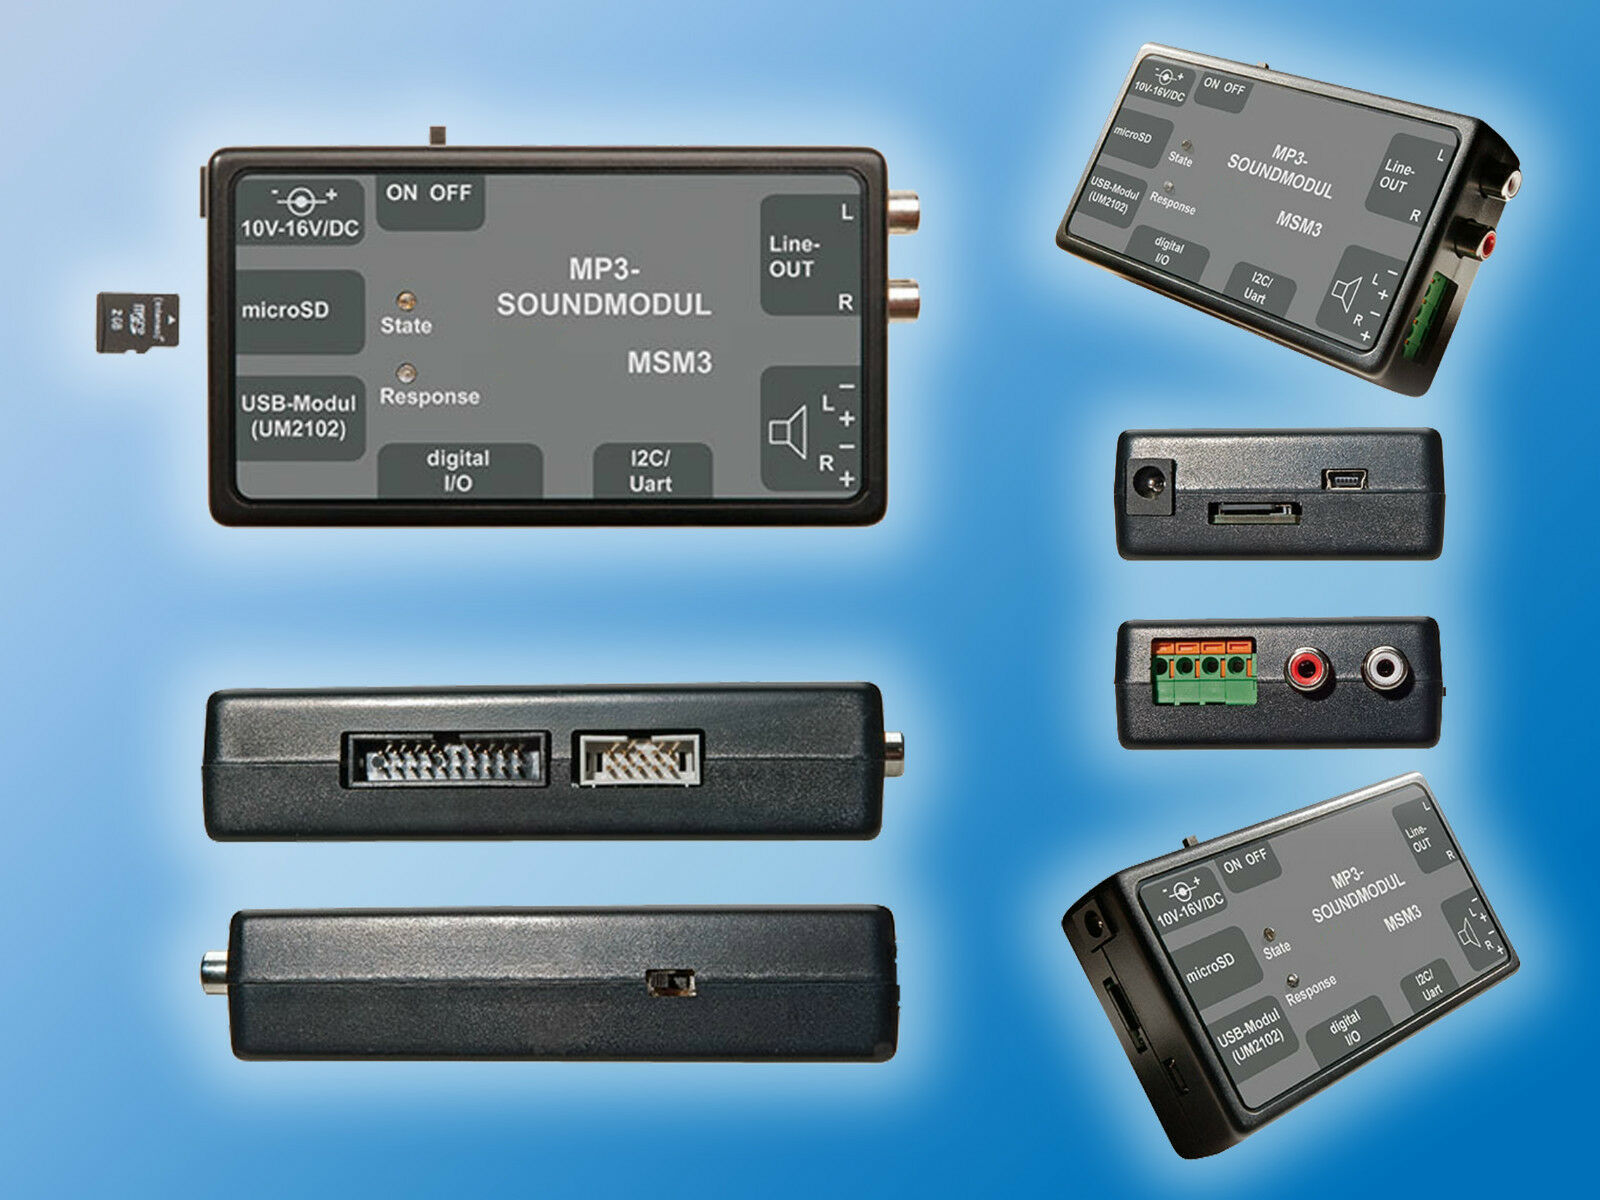 MP3 Soundmodul   MSM3   USB   microSD Karte   Netzteil   Verbinder   Flachkabel